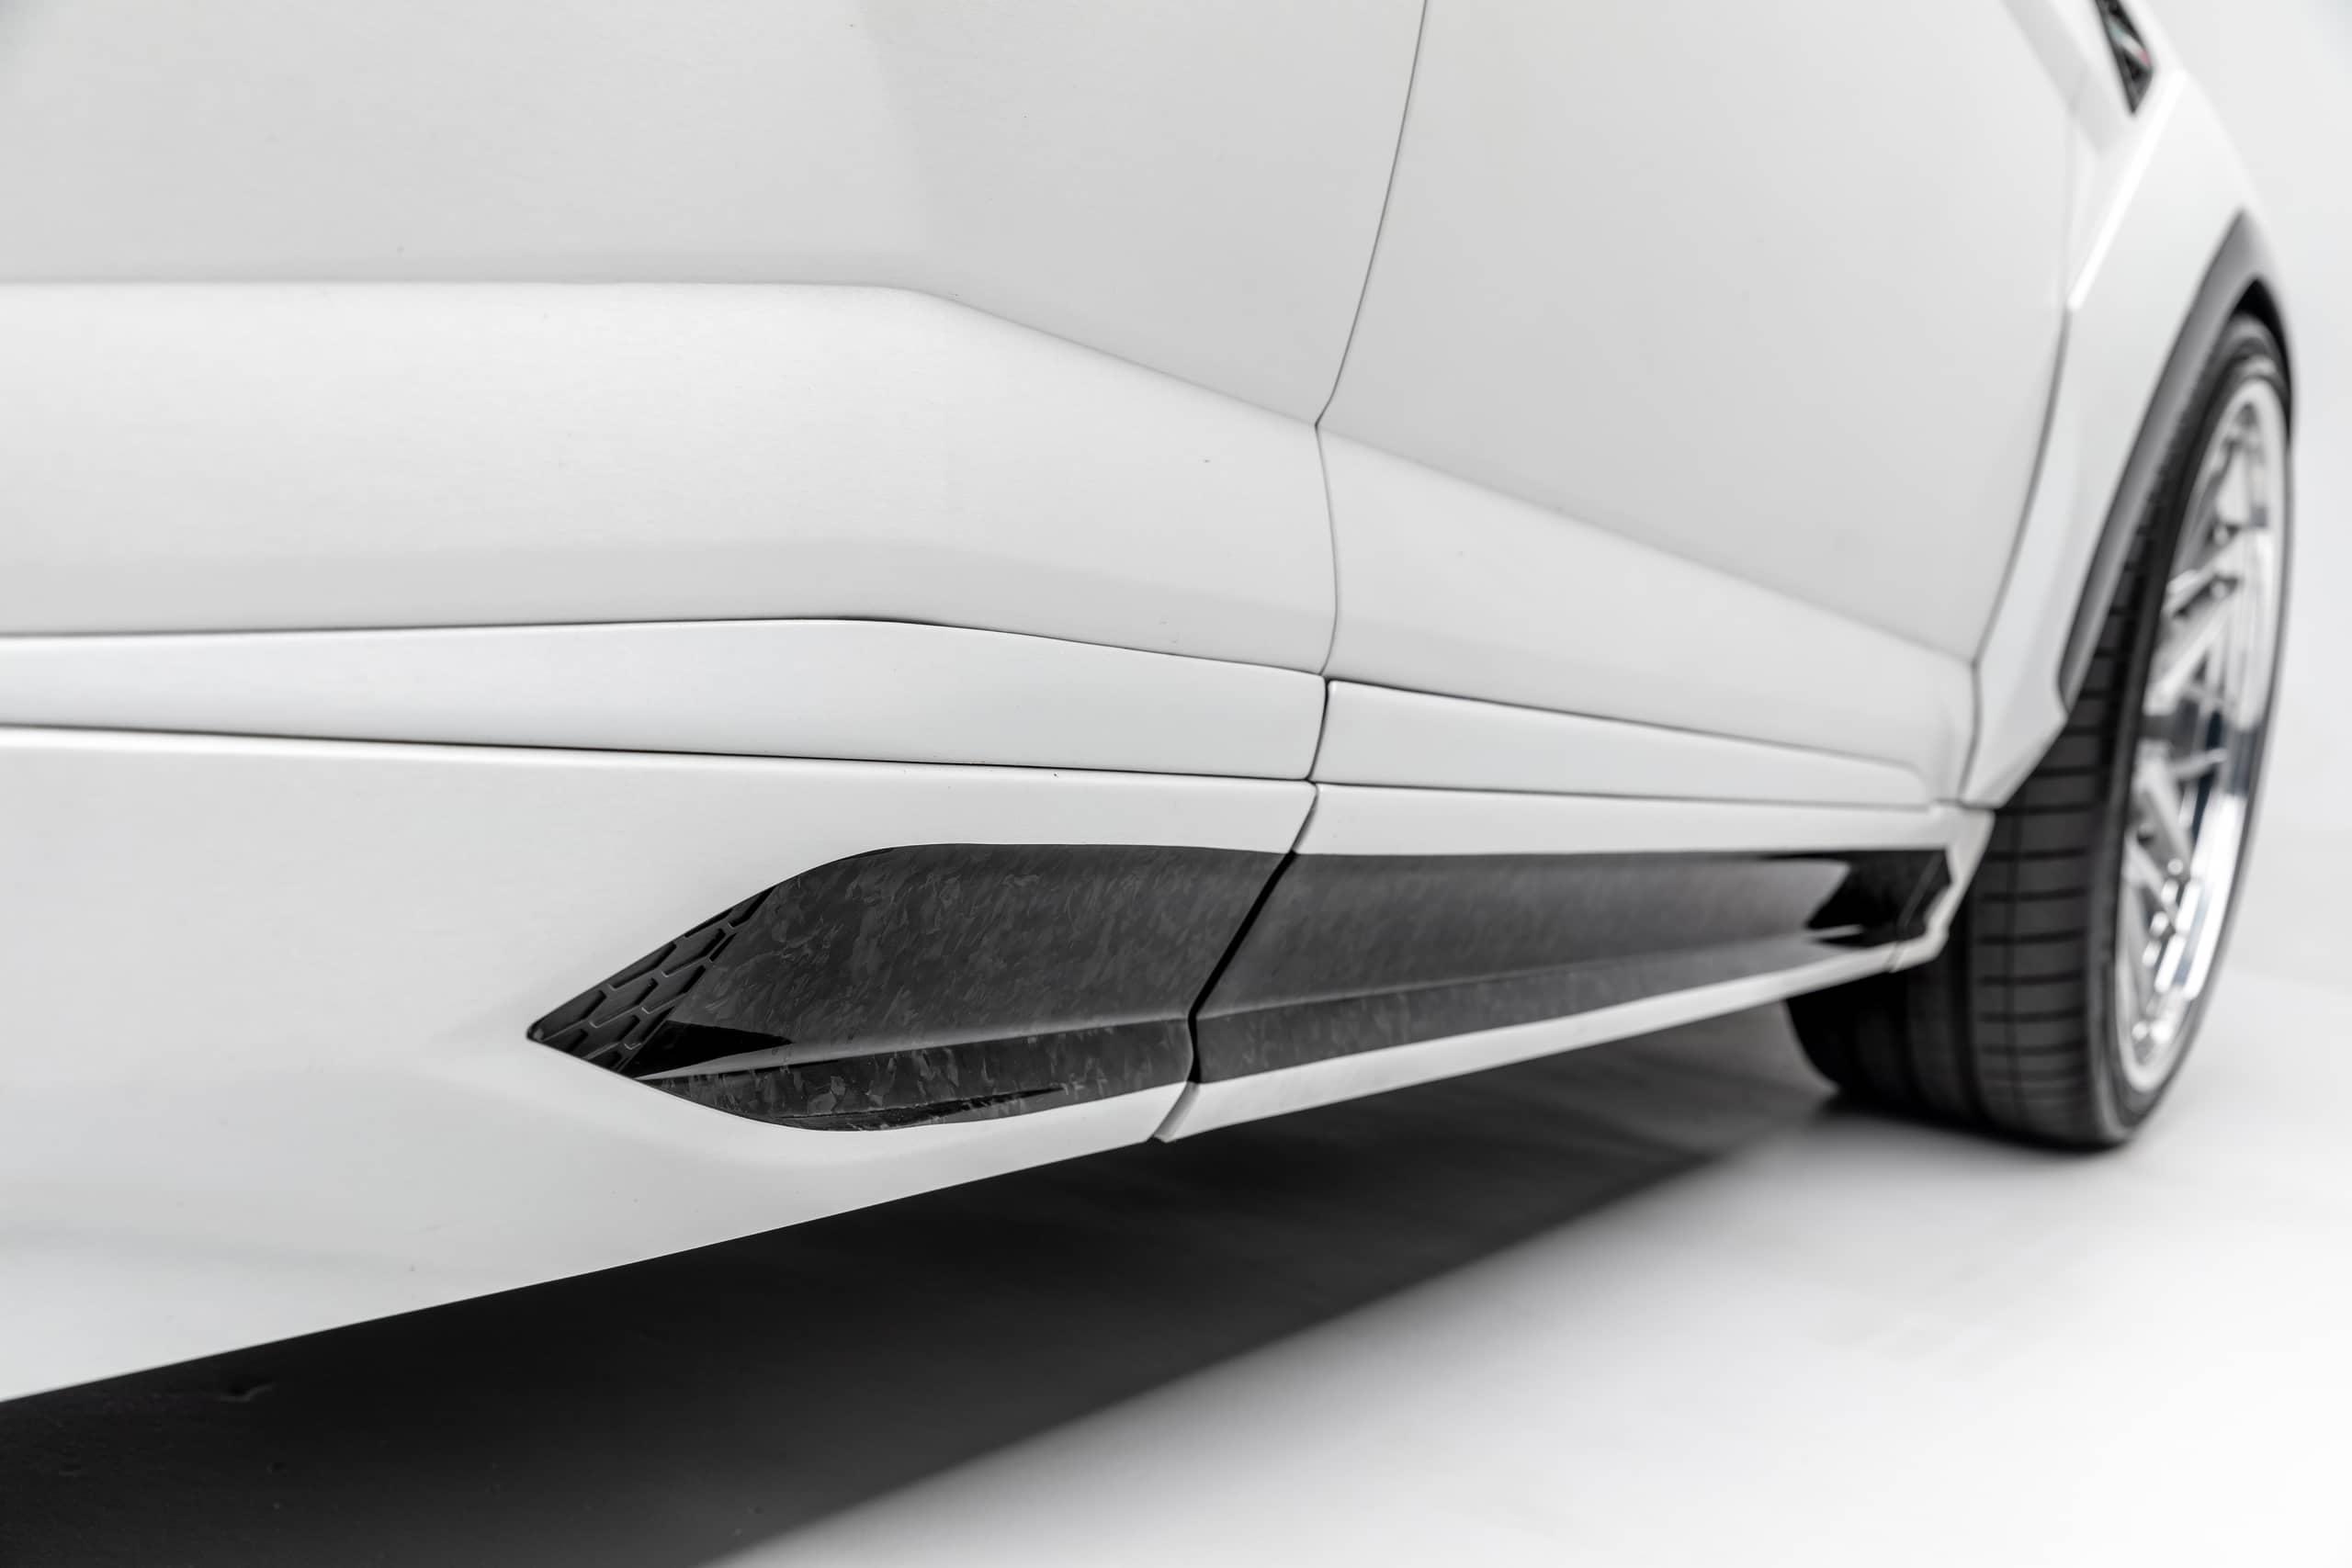 Lamborghini-Urus-by-1016-Industries-12